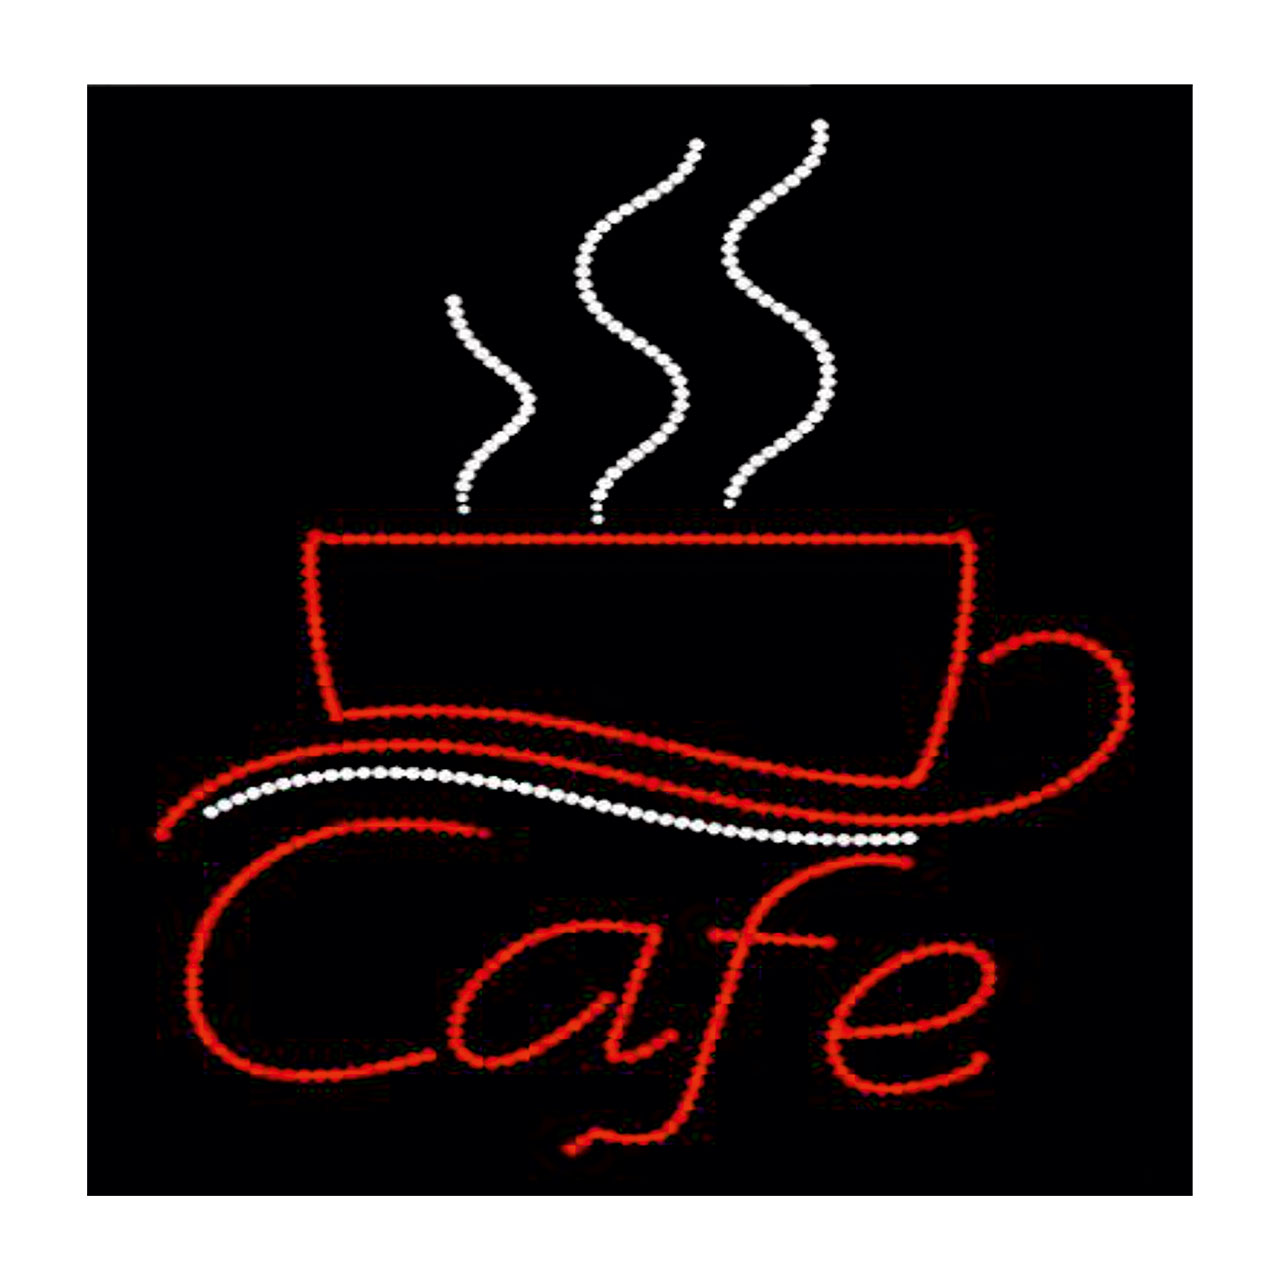 تابلو ال ای دی طرح کافه مدل تک فنجان